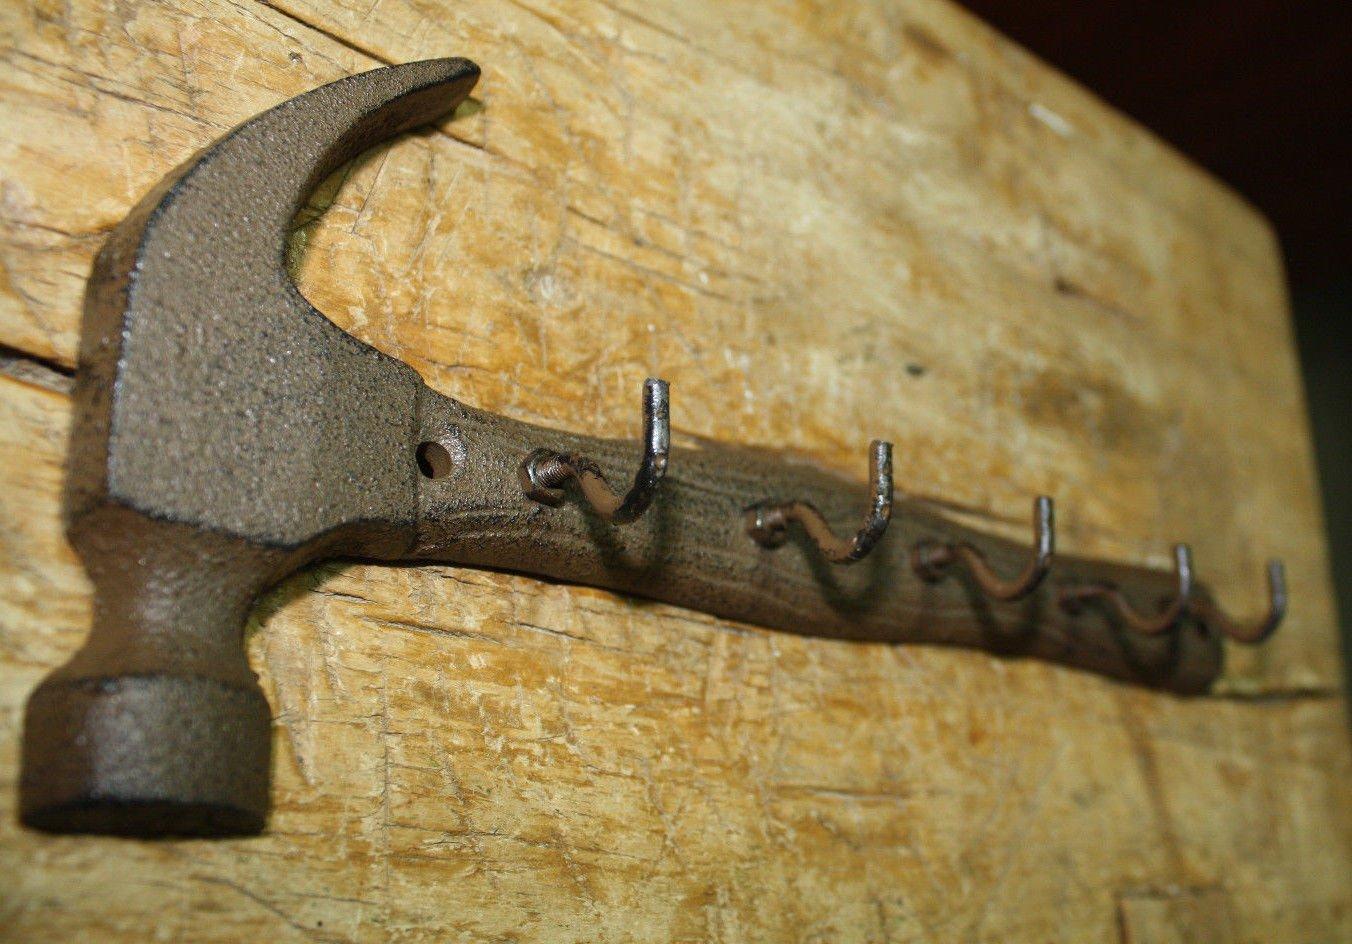 Coat Hooks Cast Iron WRENCH Towel Key Rack Tool Carpenter MAN CAVE Hat Hook